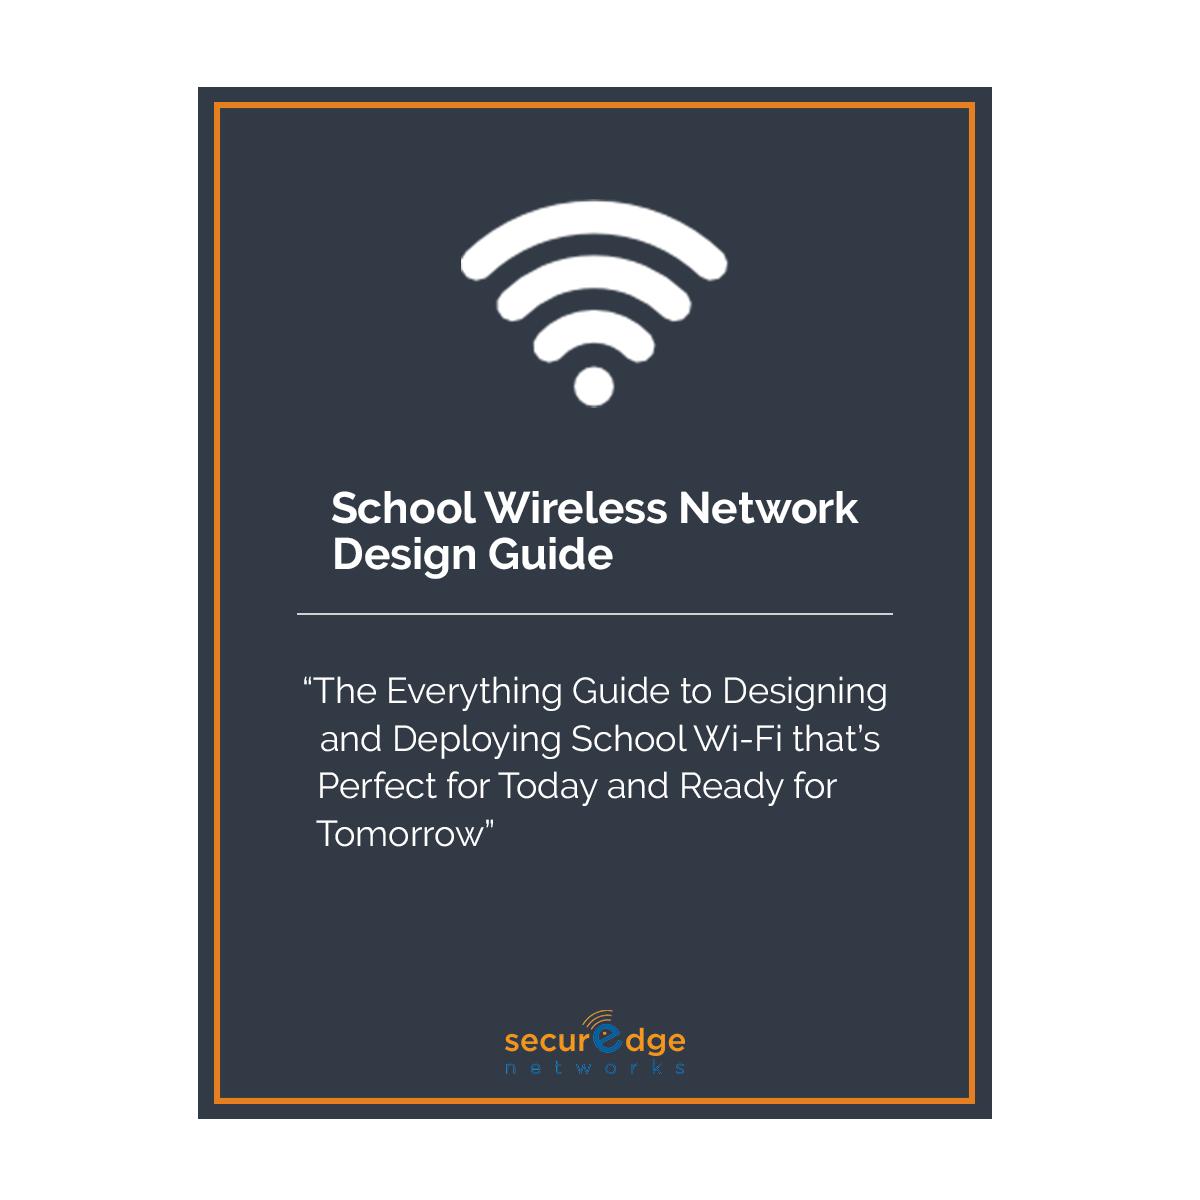 campus wireless network design case study davidson college. Black Bedroom Furniture Sets. Home Design Ideas